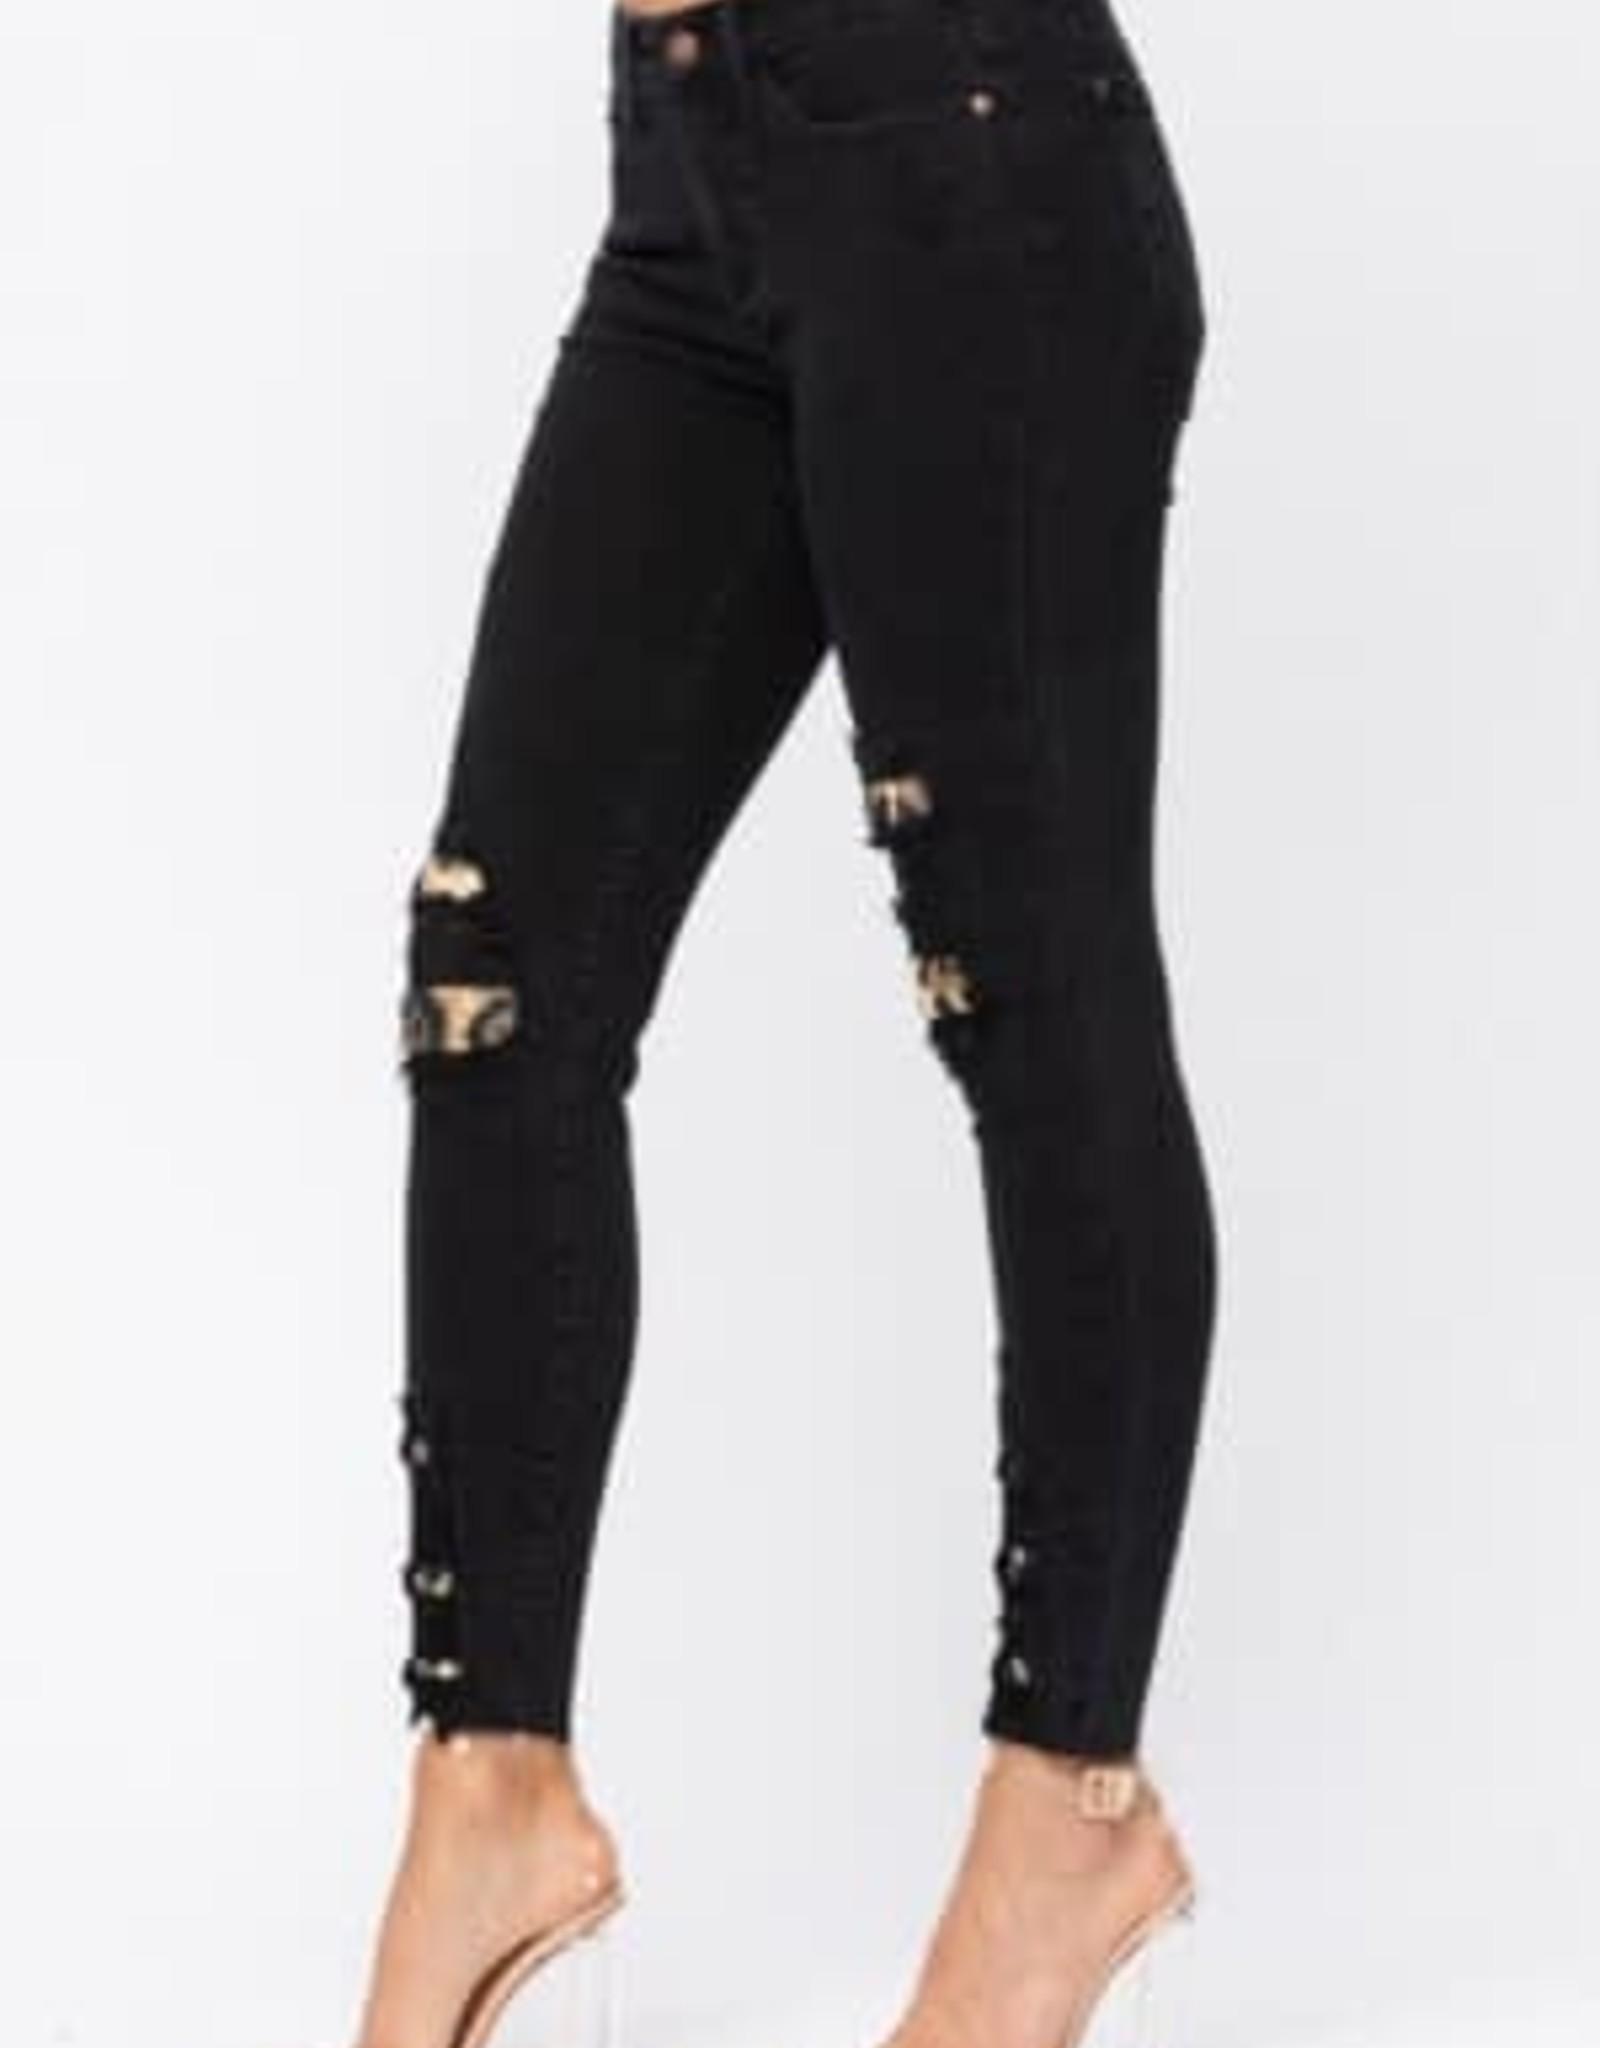 Leopard Patch Judy Blue Skinny Jeans